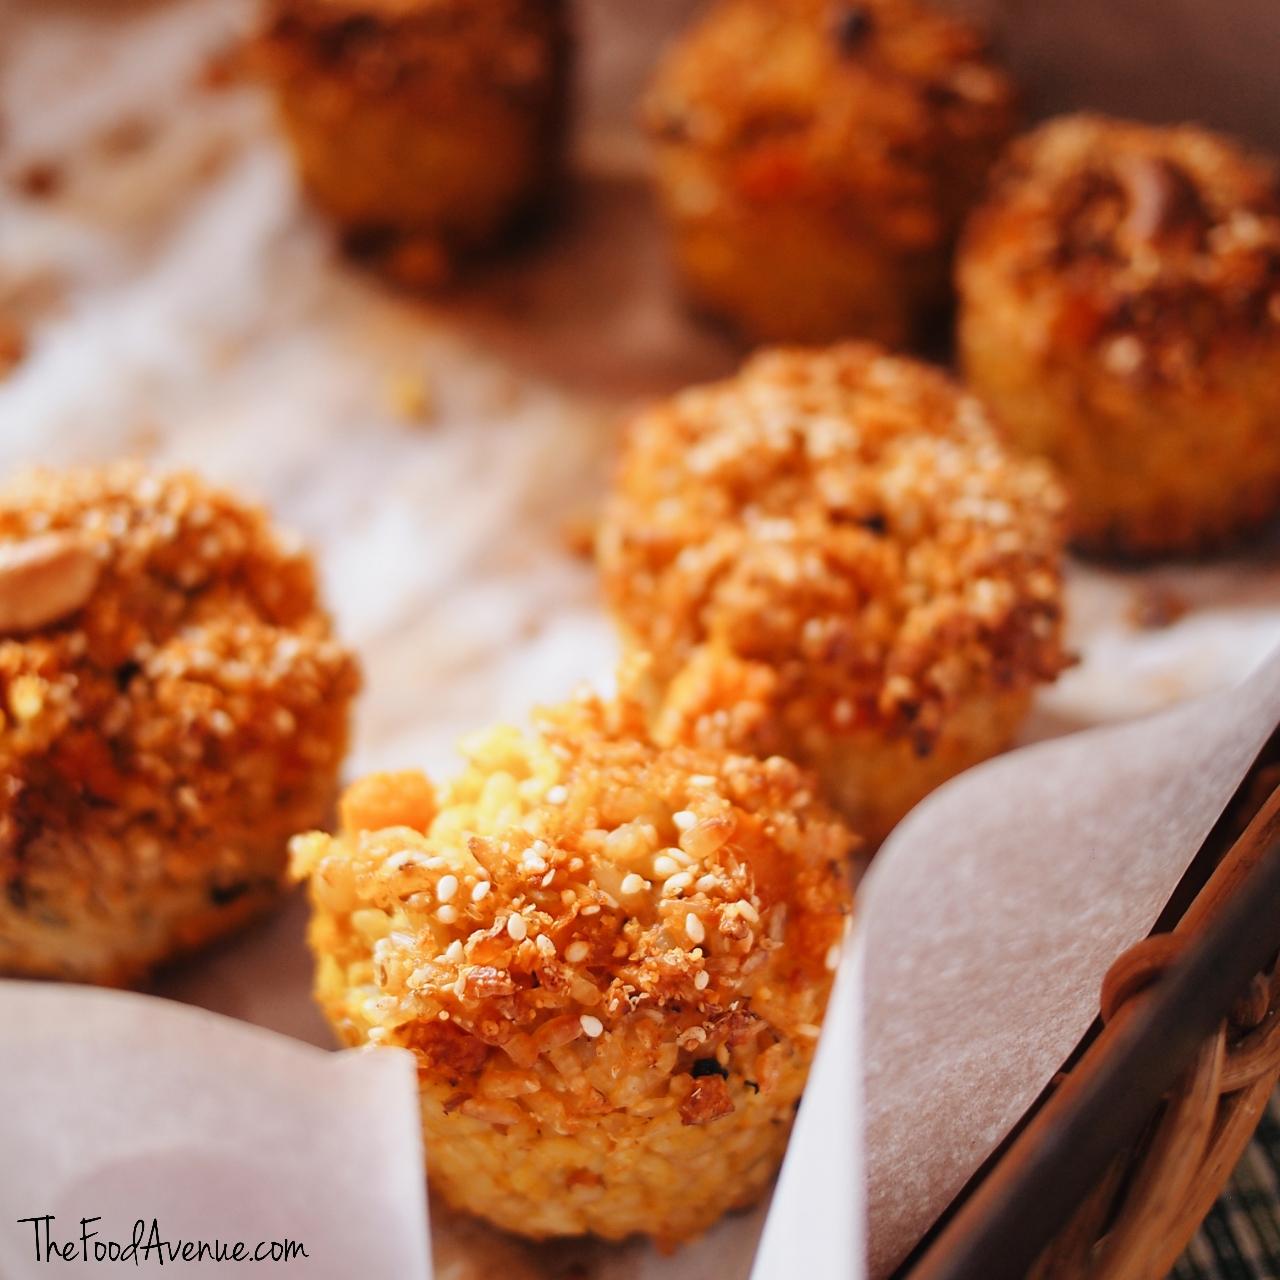 The_Food_Avenue_Tilba5